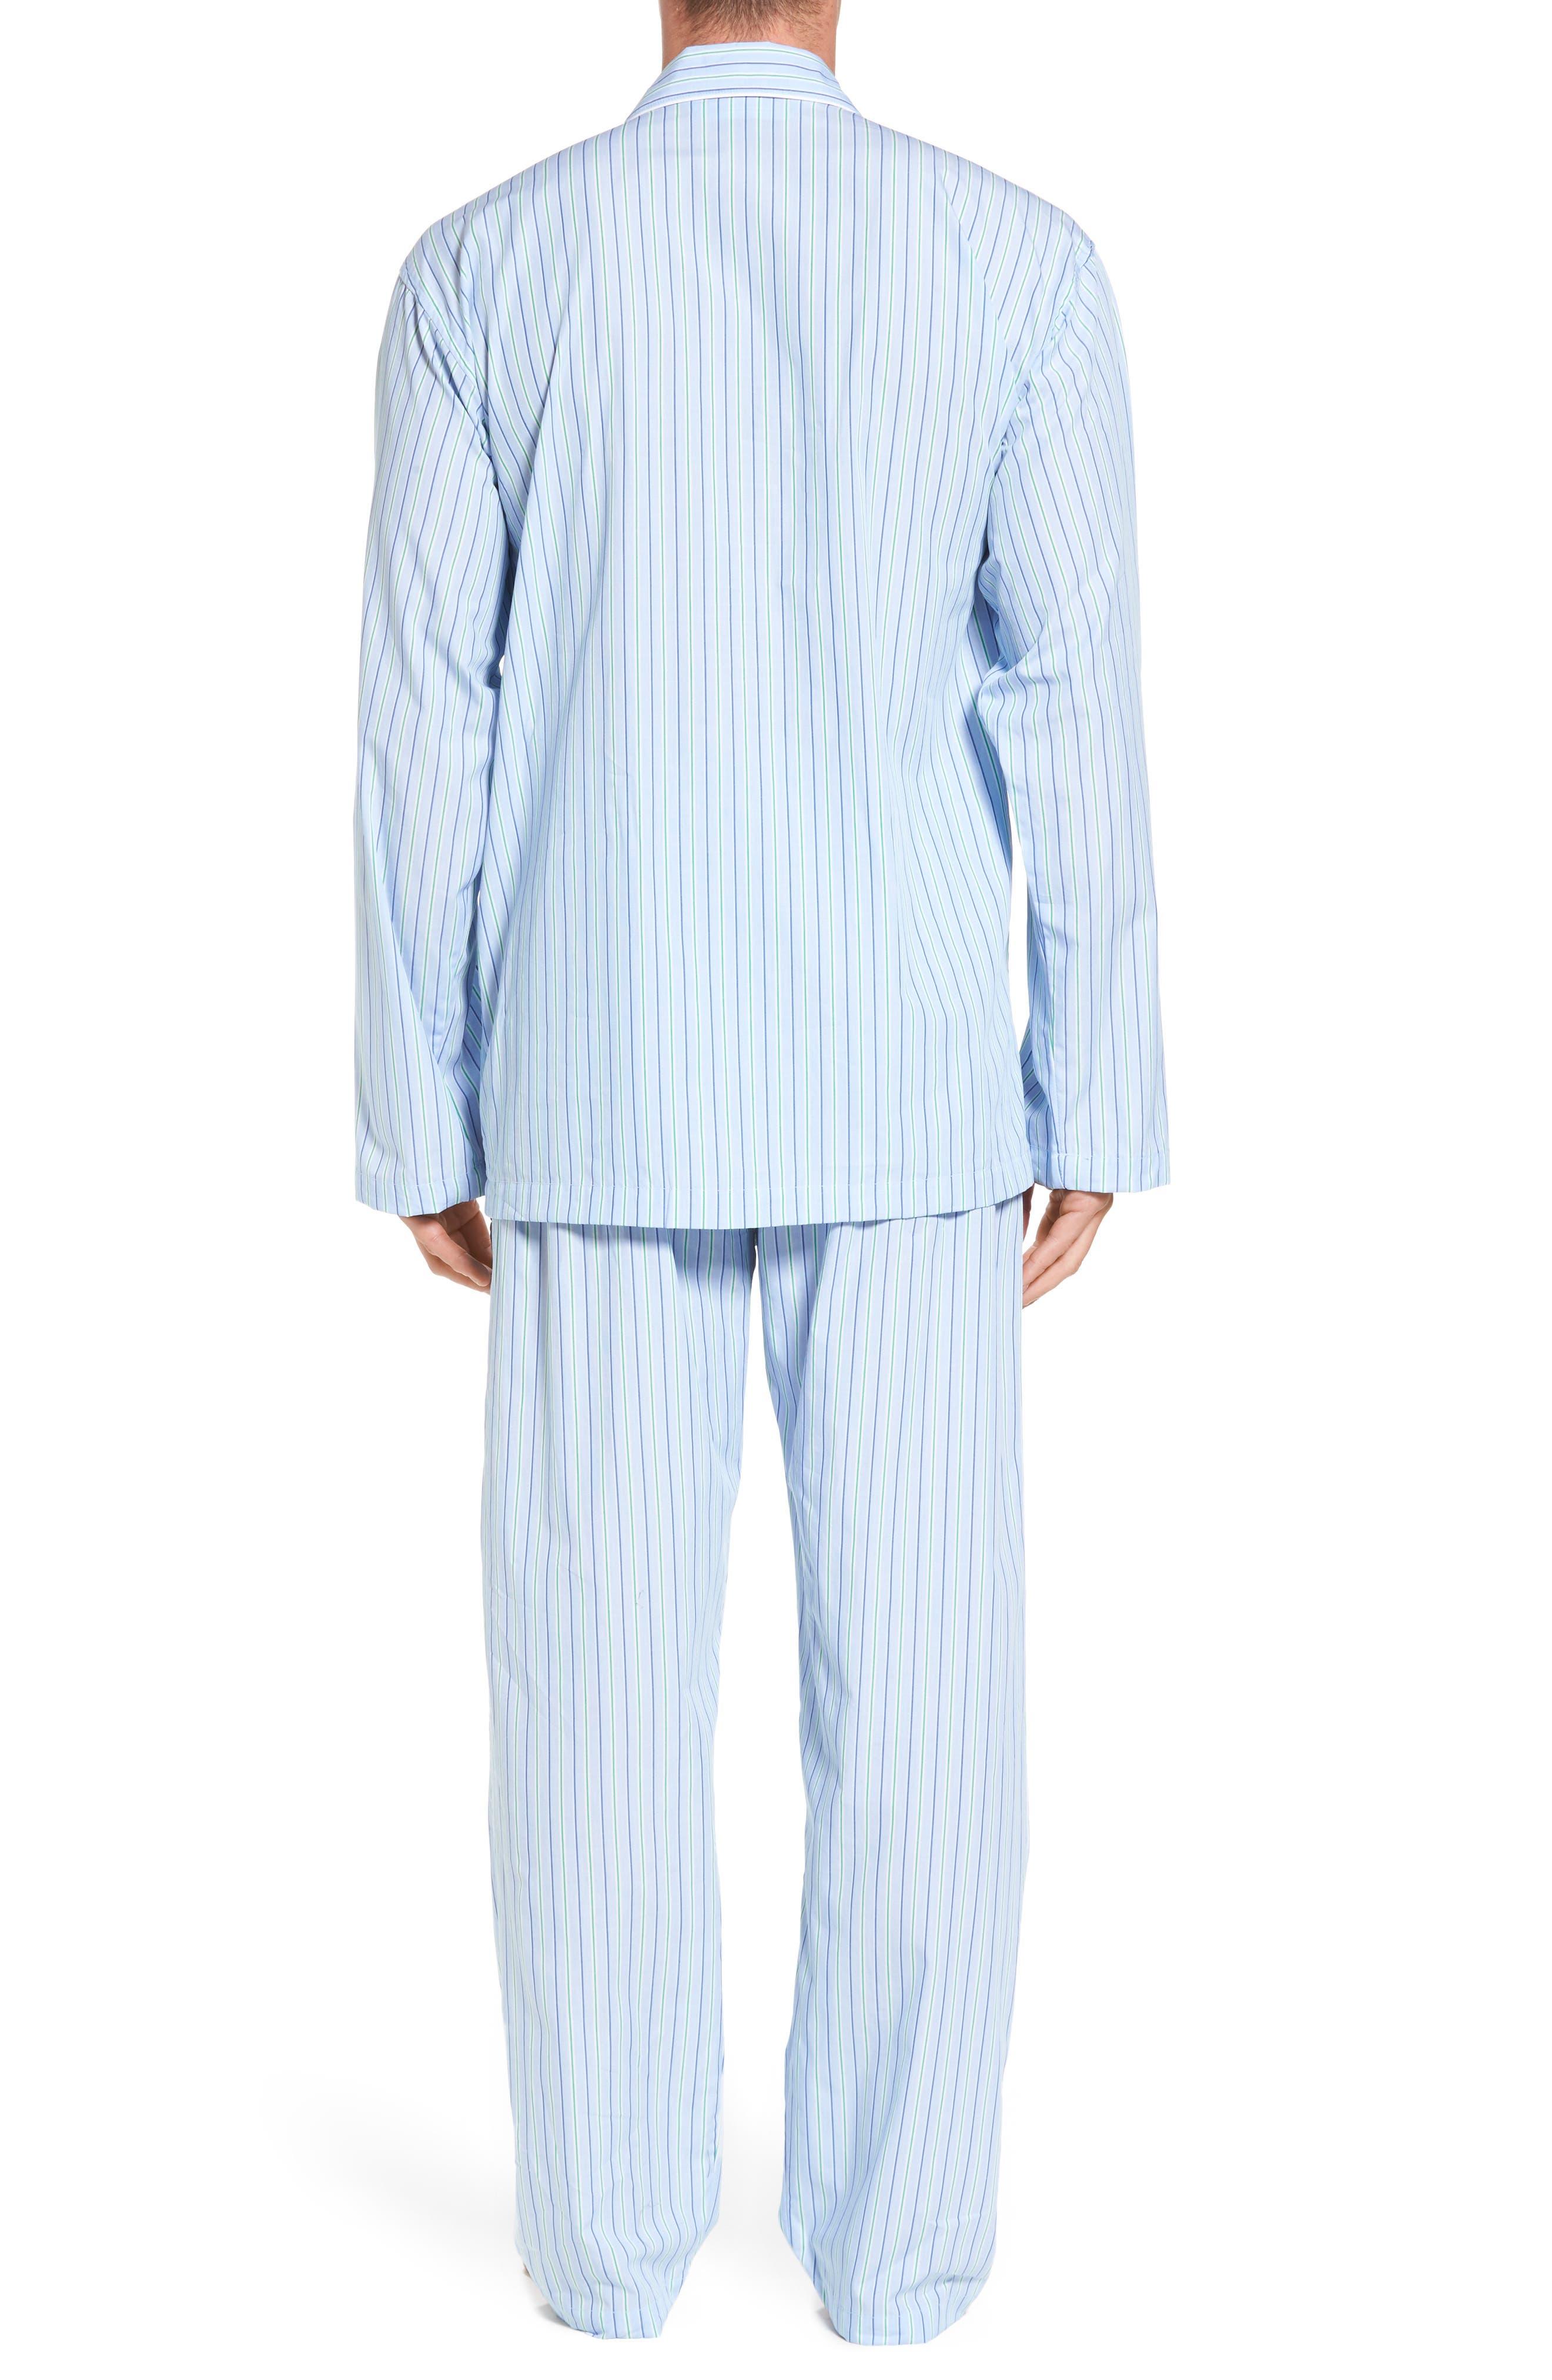 Cotton Pajama Top,                             Alternate thumbnail 2, color,                             BARI STRIPE